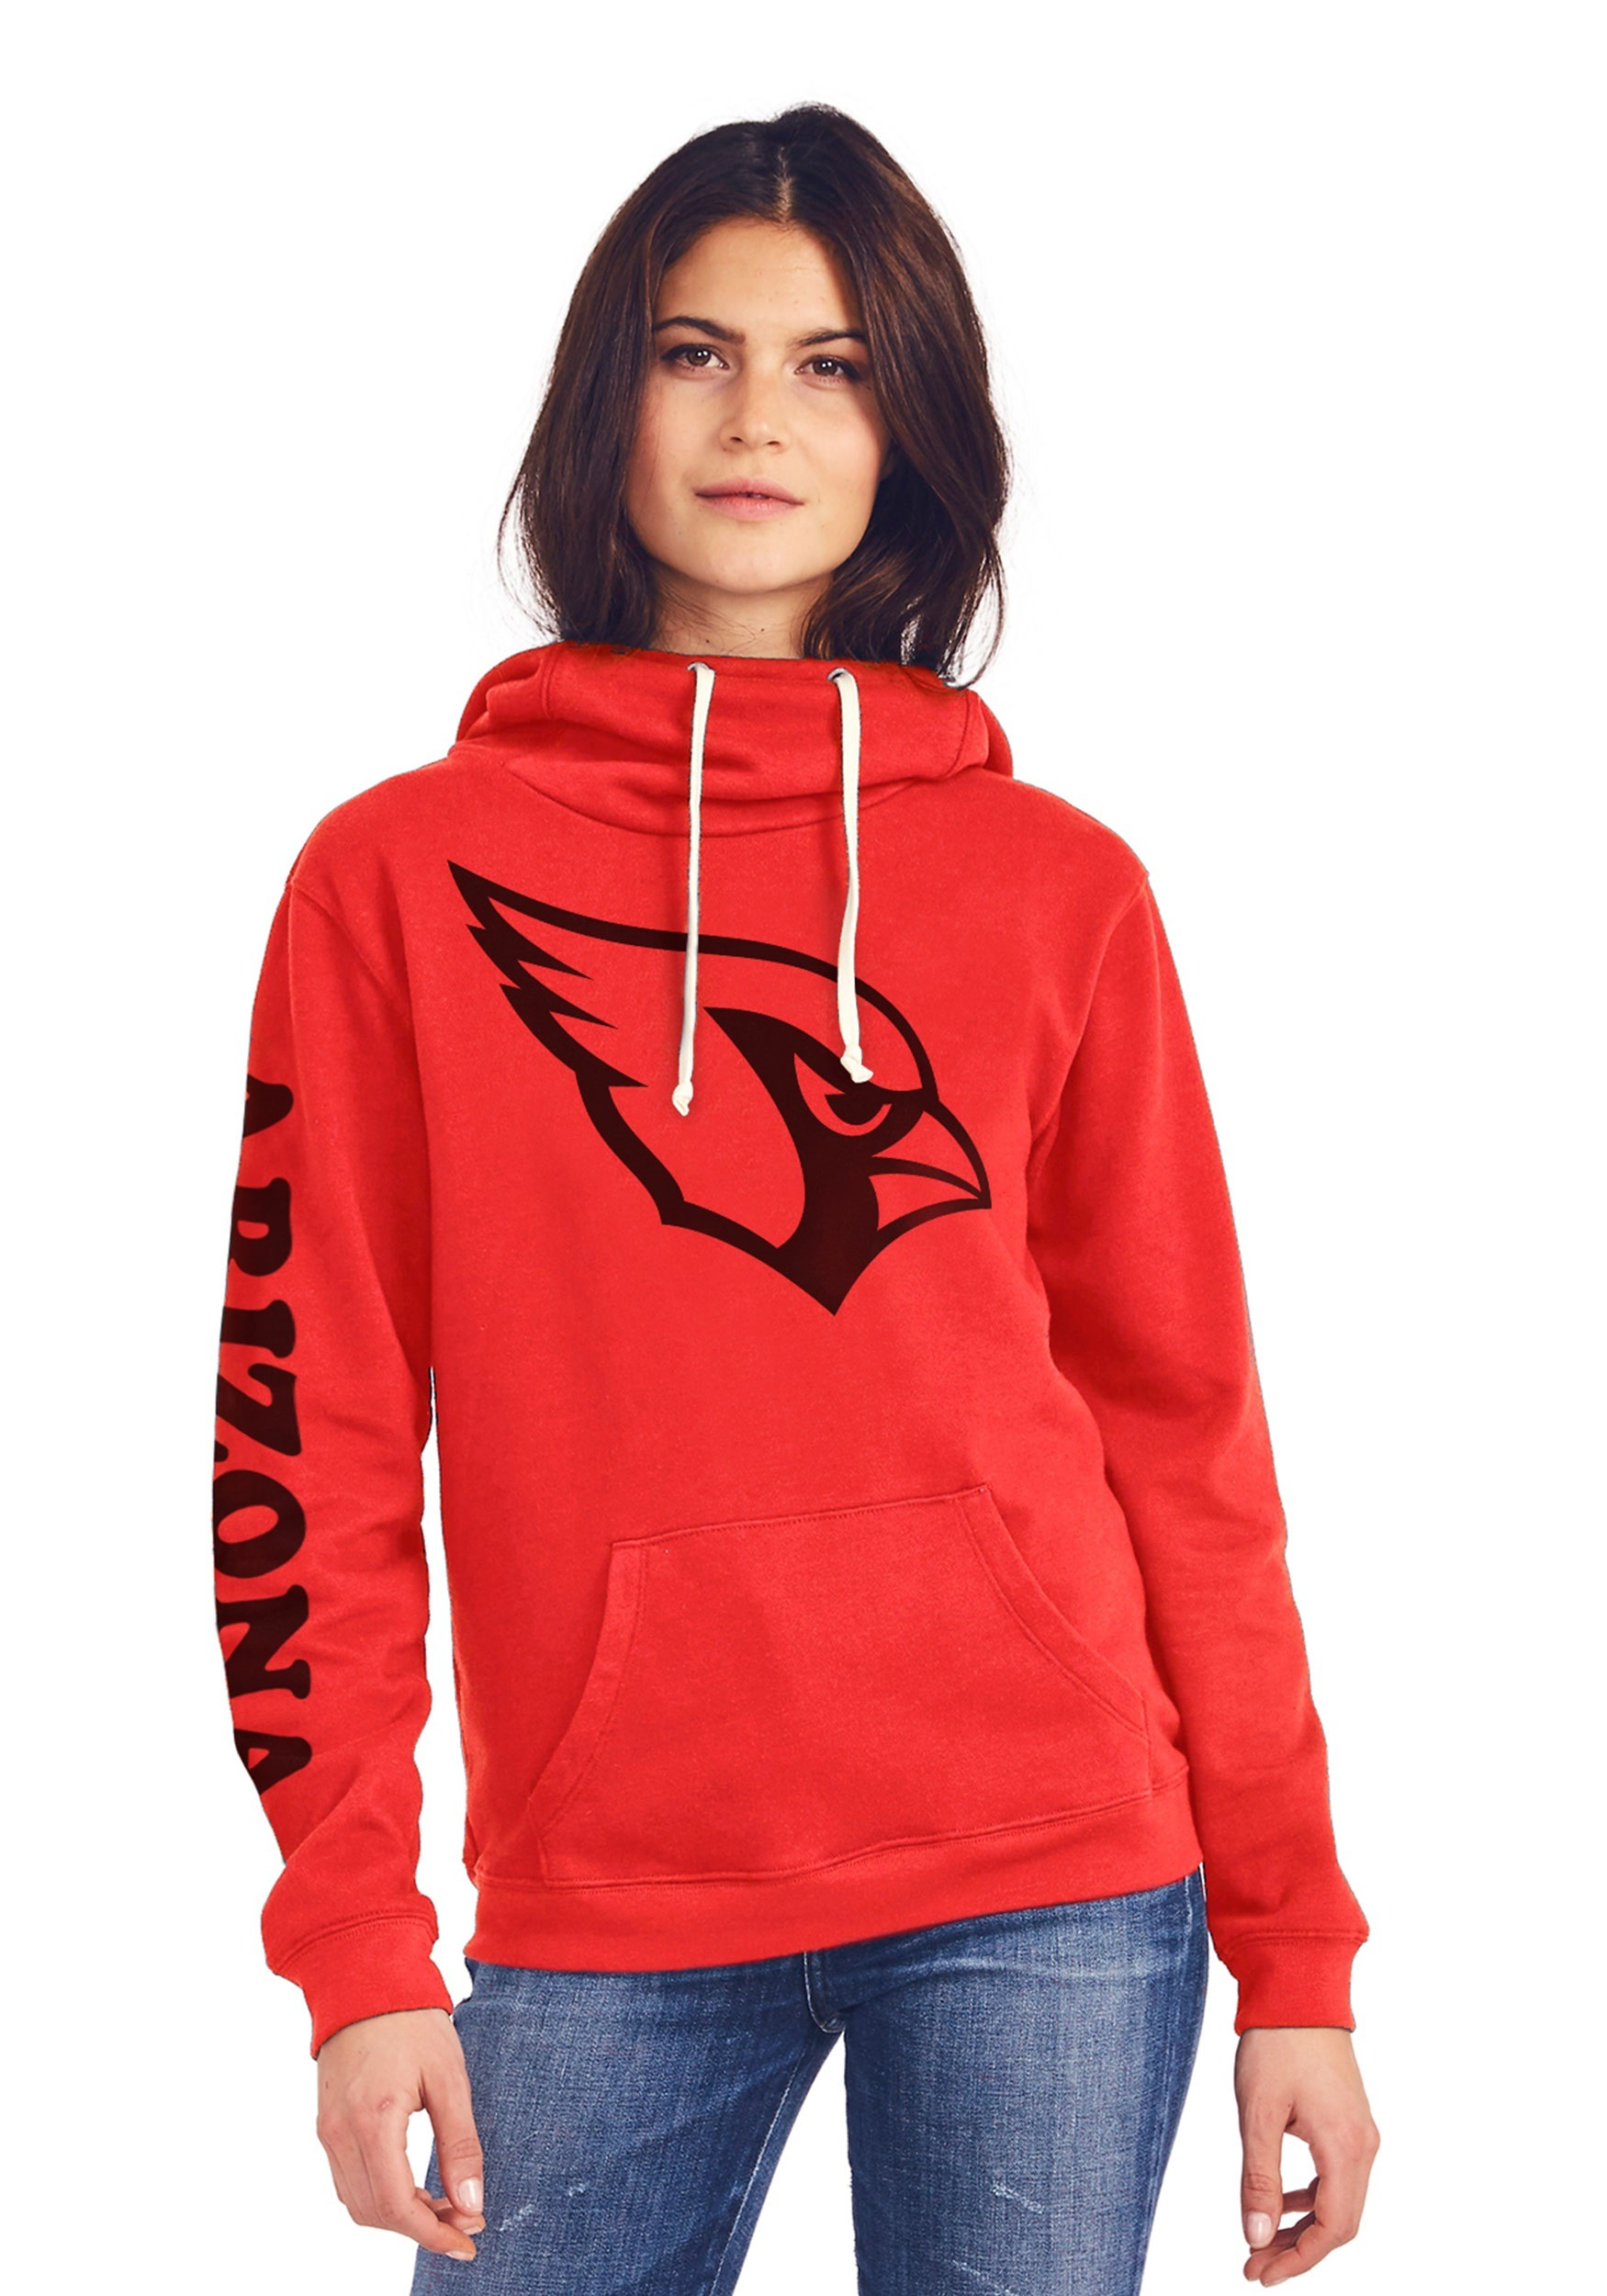 Cowl neck hoodies